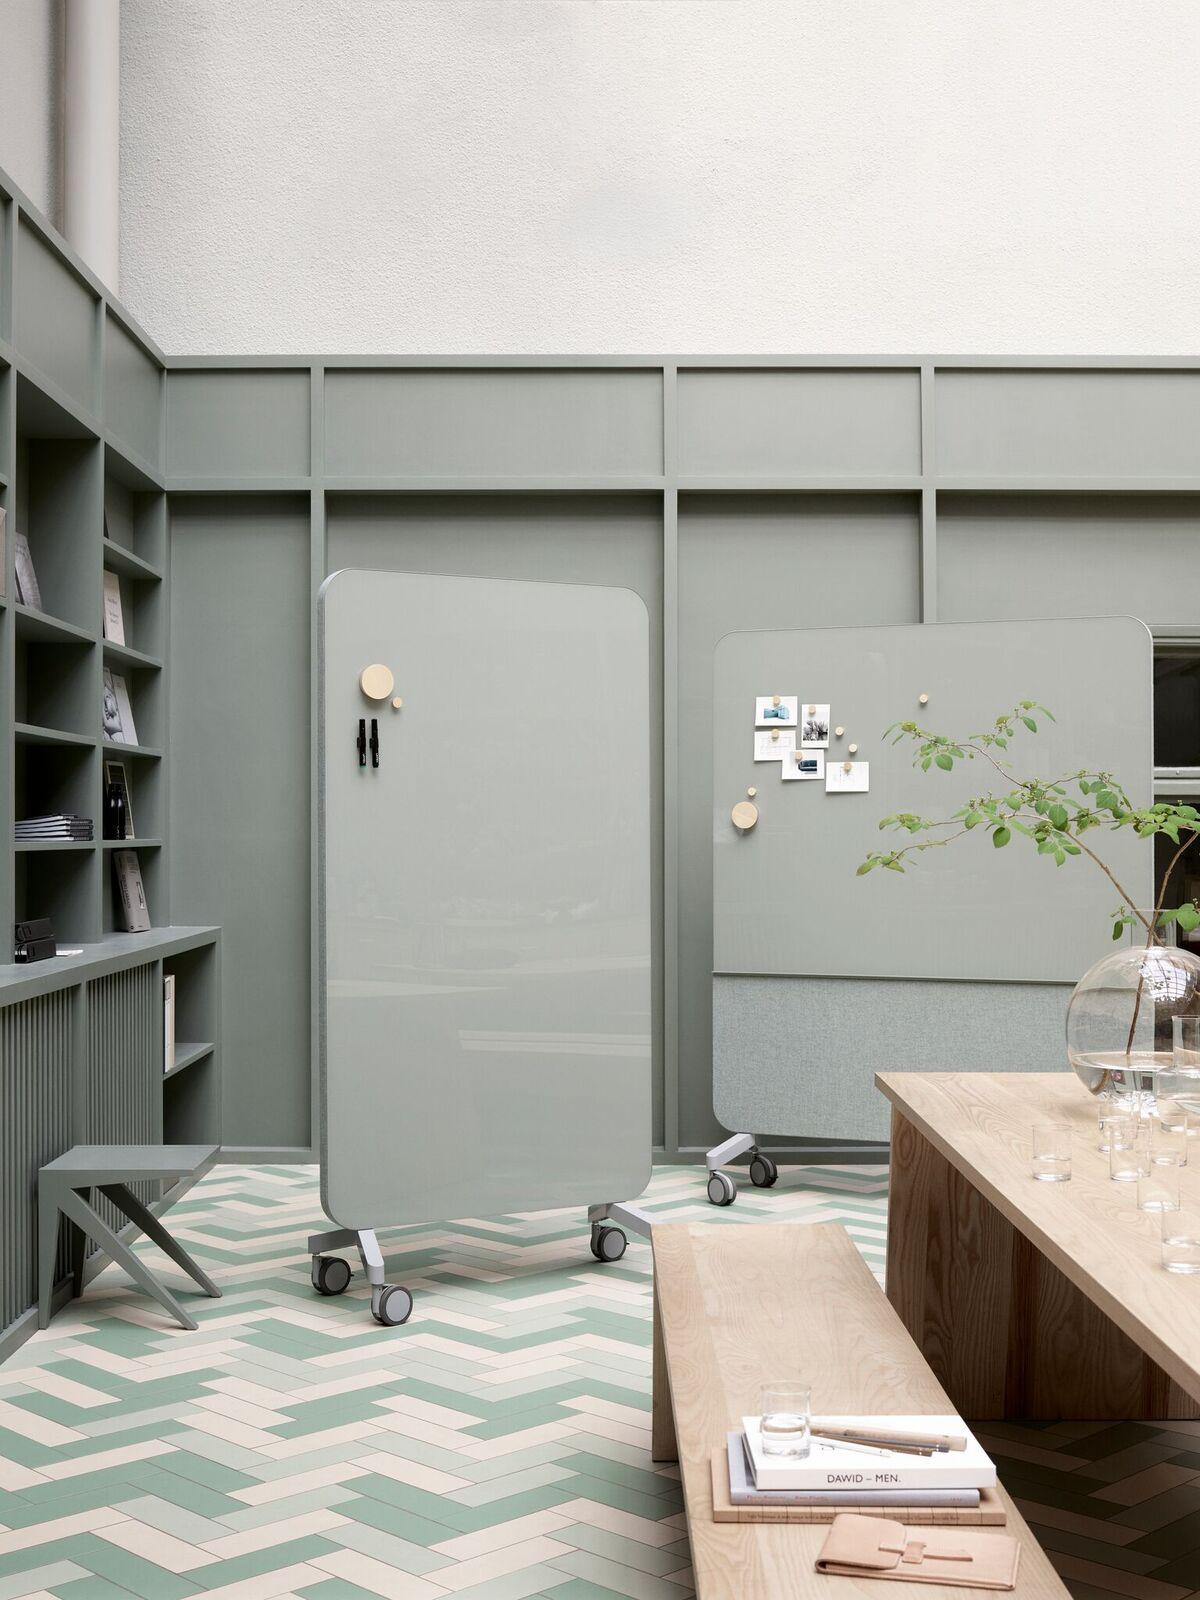 Mood Fabric Mobile, Design Christian Halleröd & Matti Klenell © Lintex